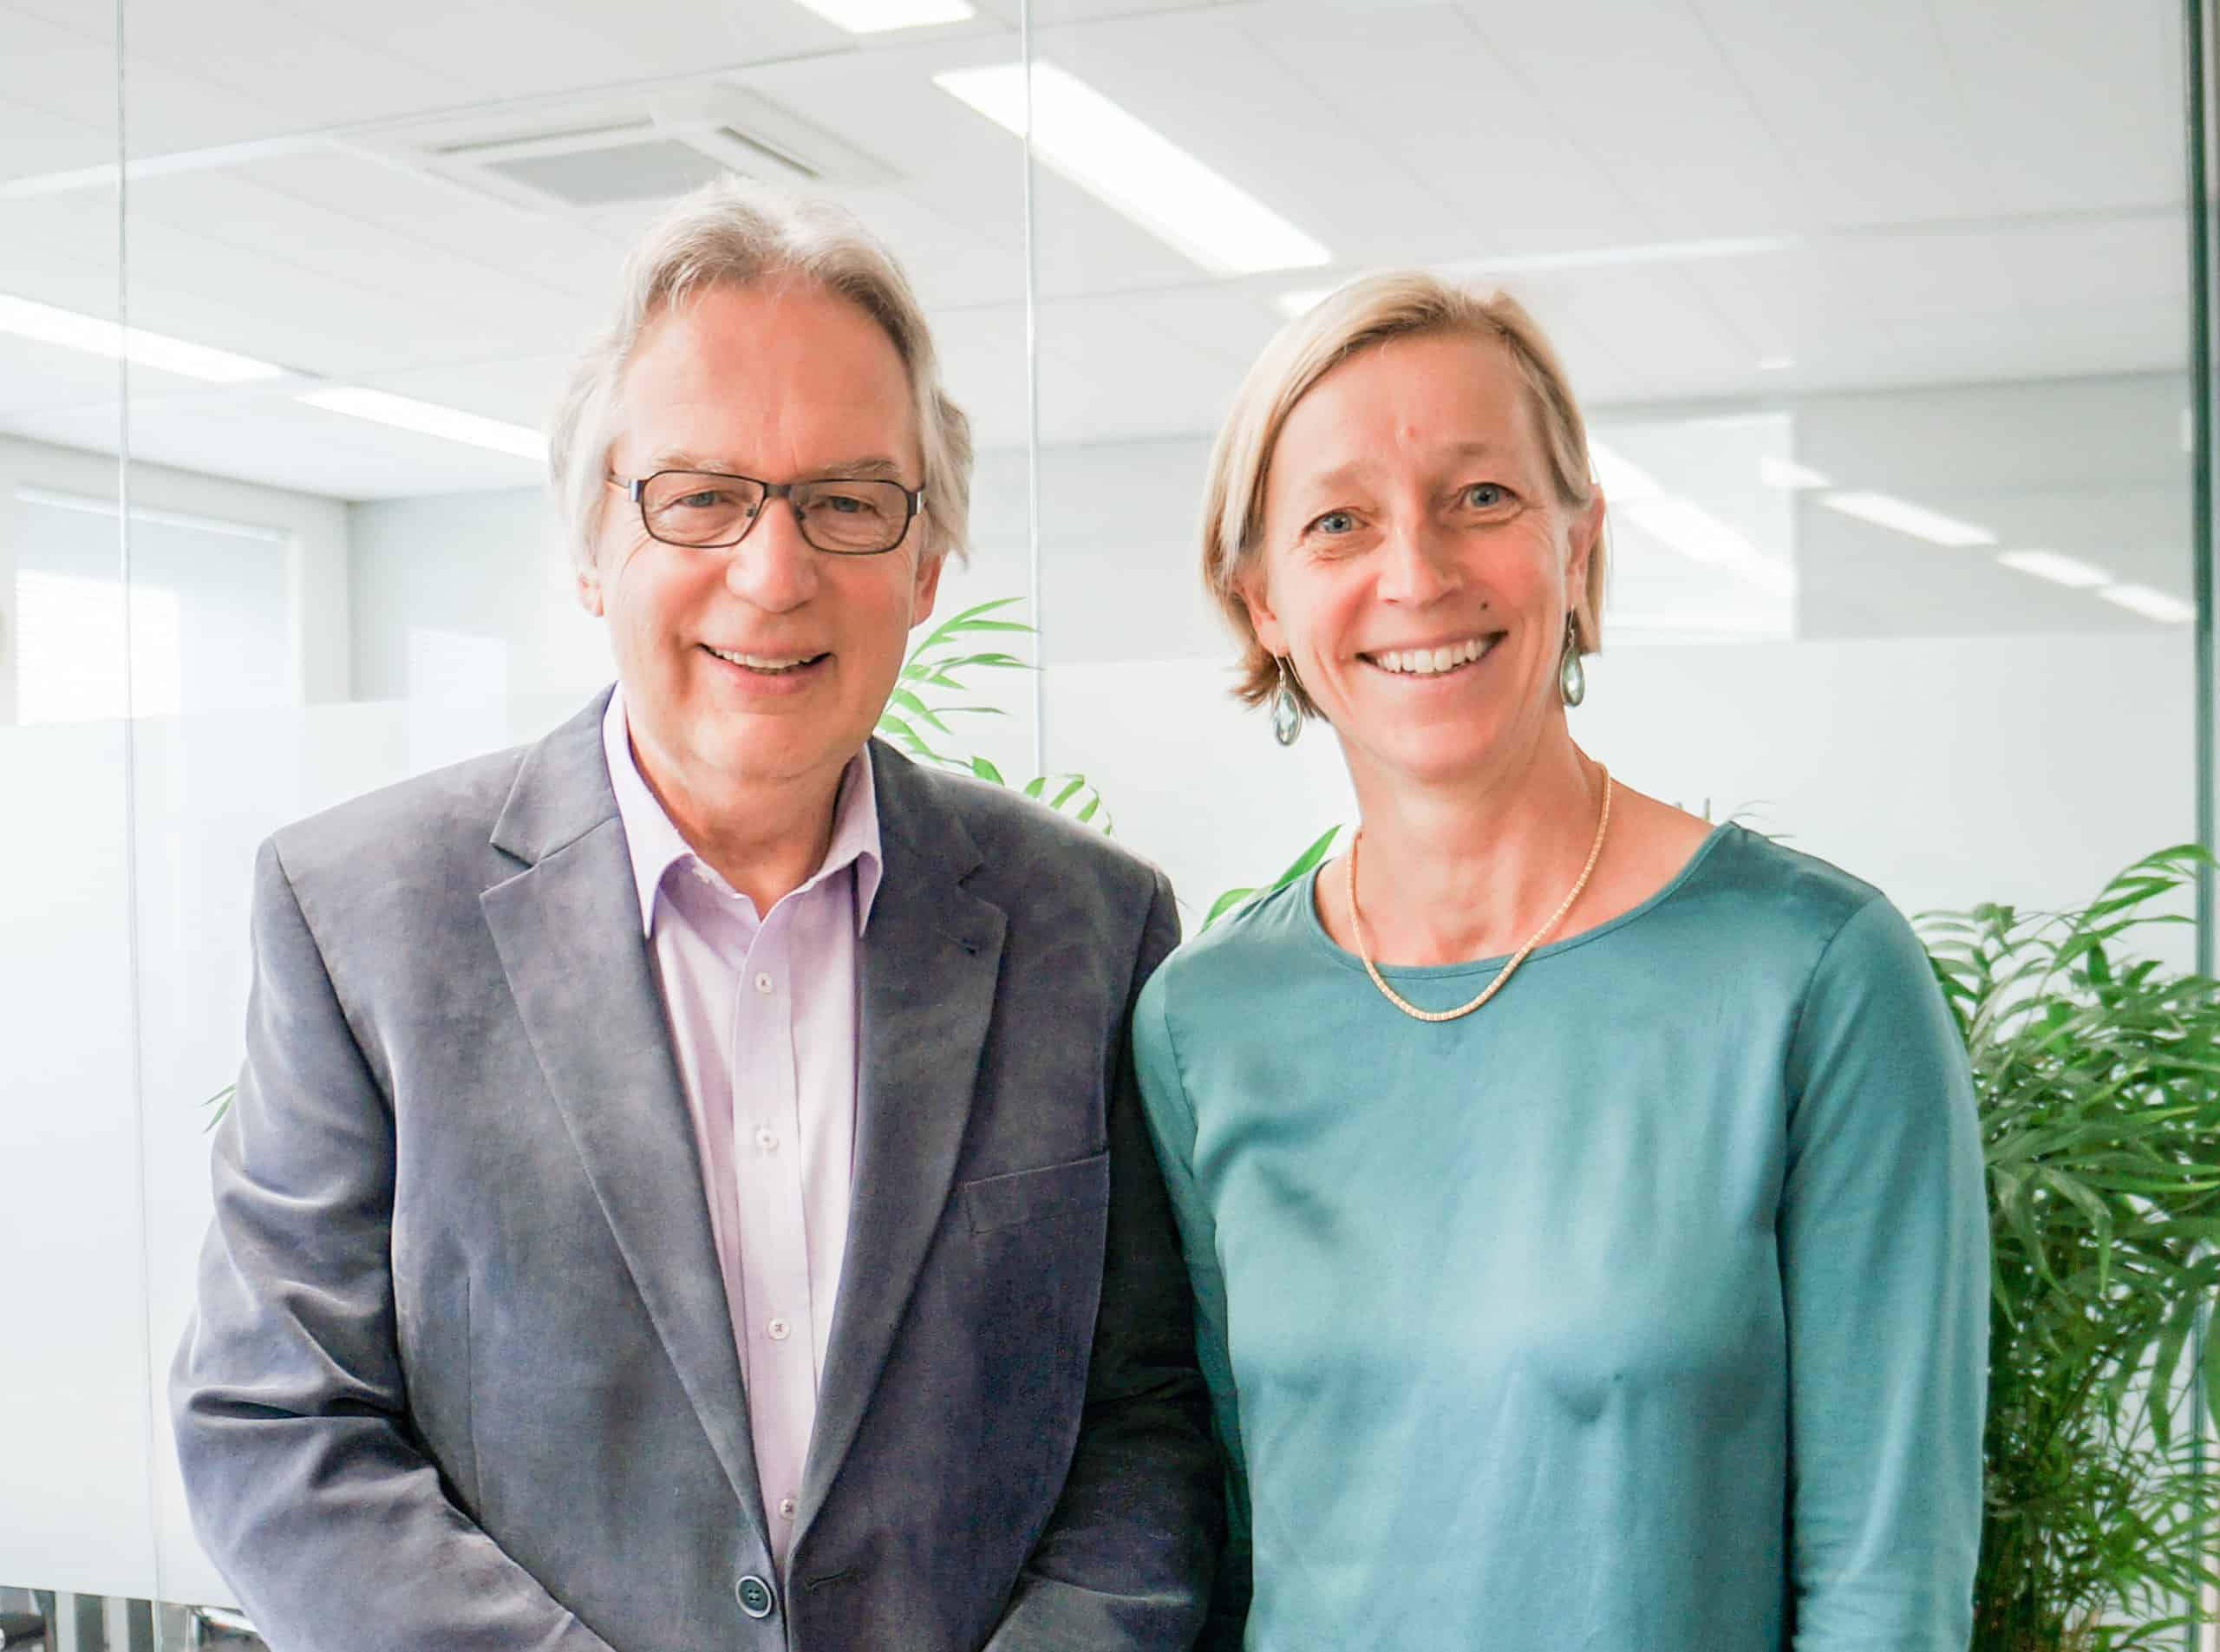 Martin Pol en Marjolein Steyerberg, de oprichters van Polteq